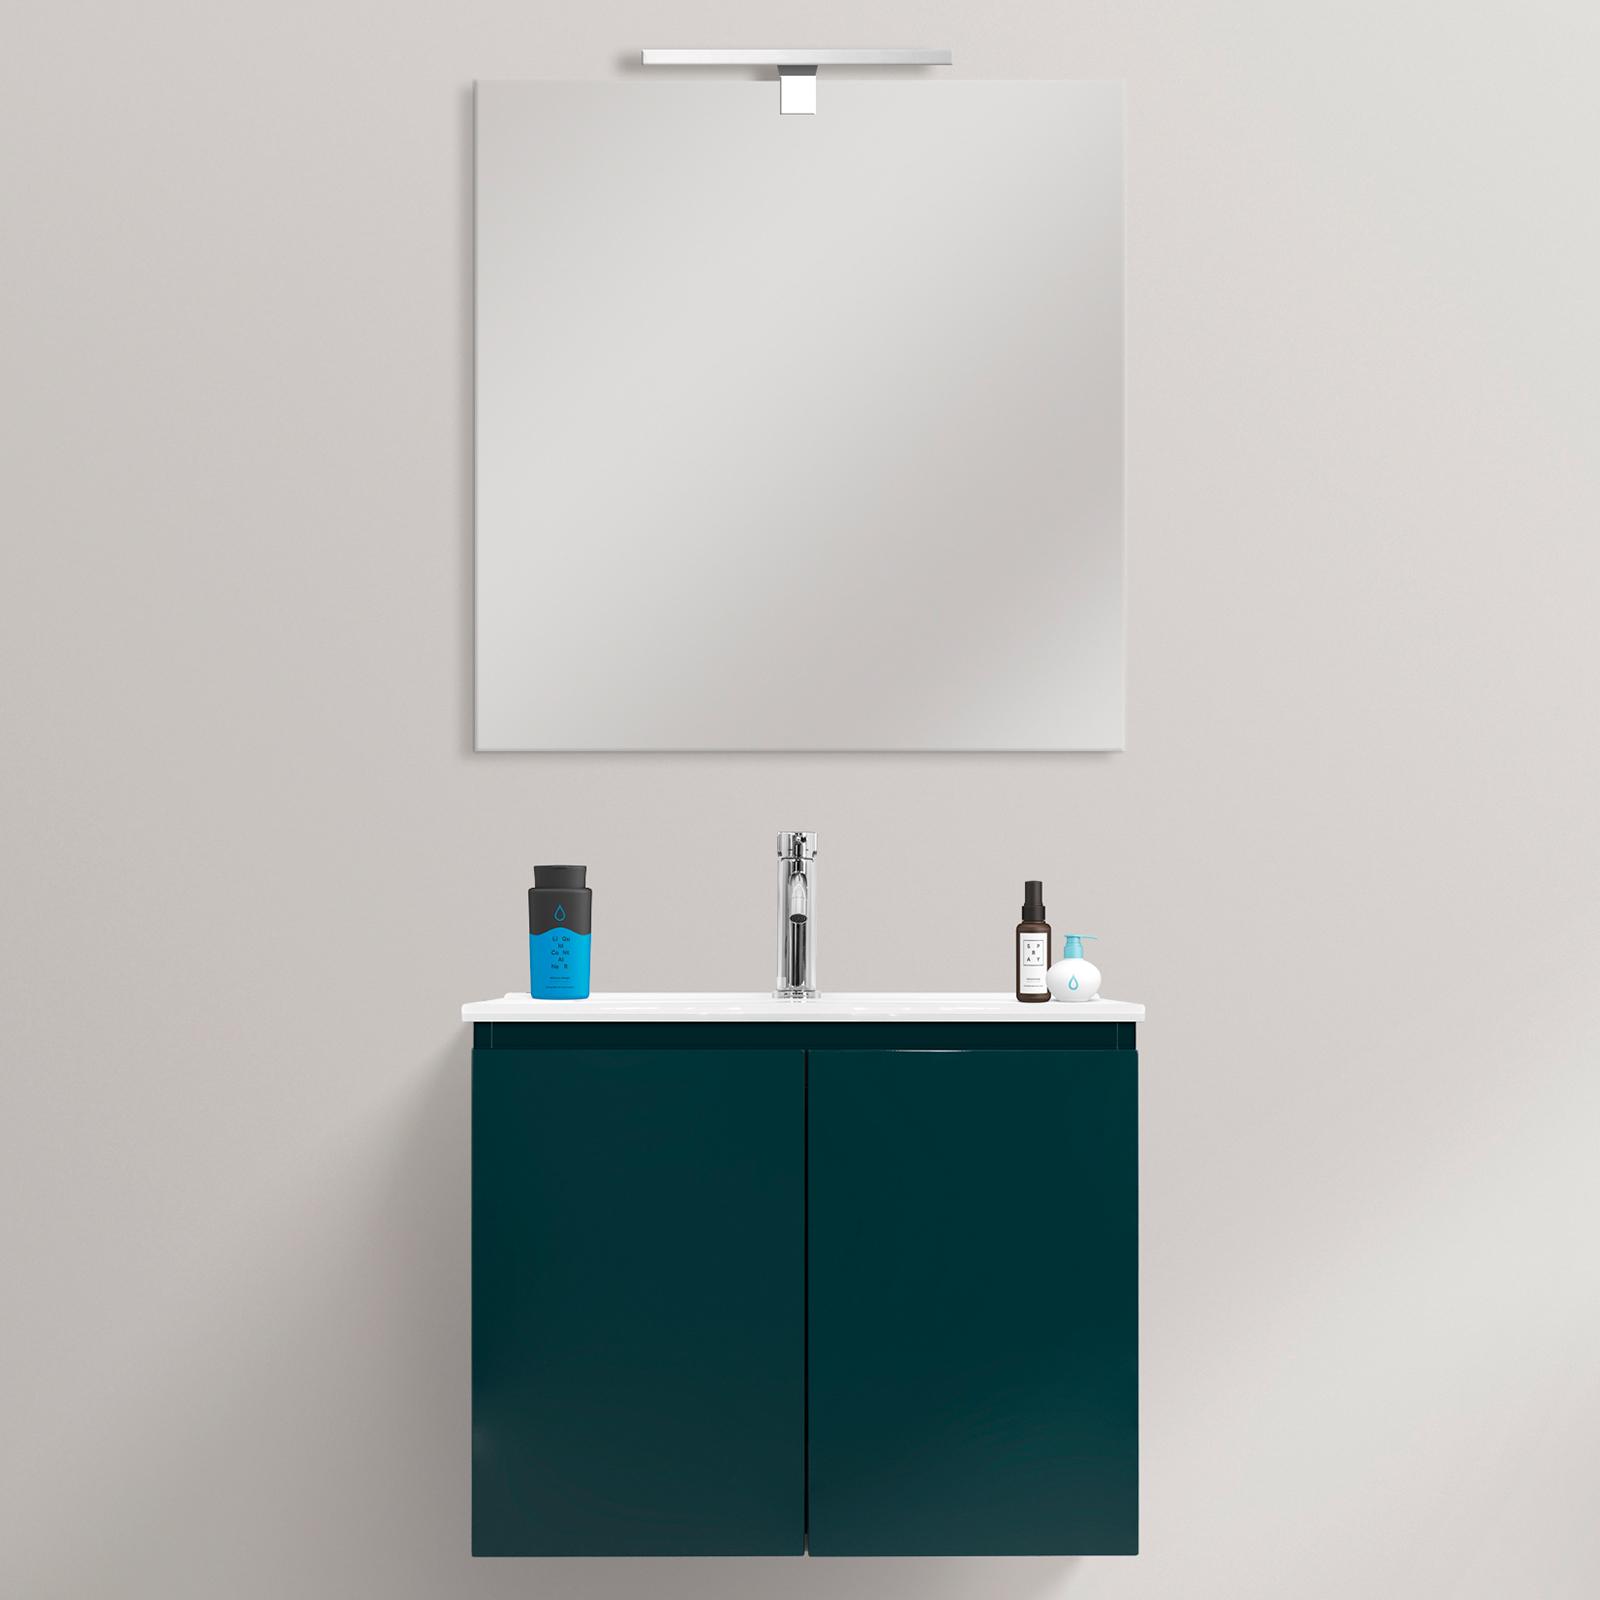 Wall Hung Ultra Slim Bathroom Vanity Made Of Mdf 60x36cm